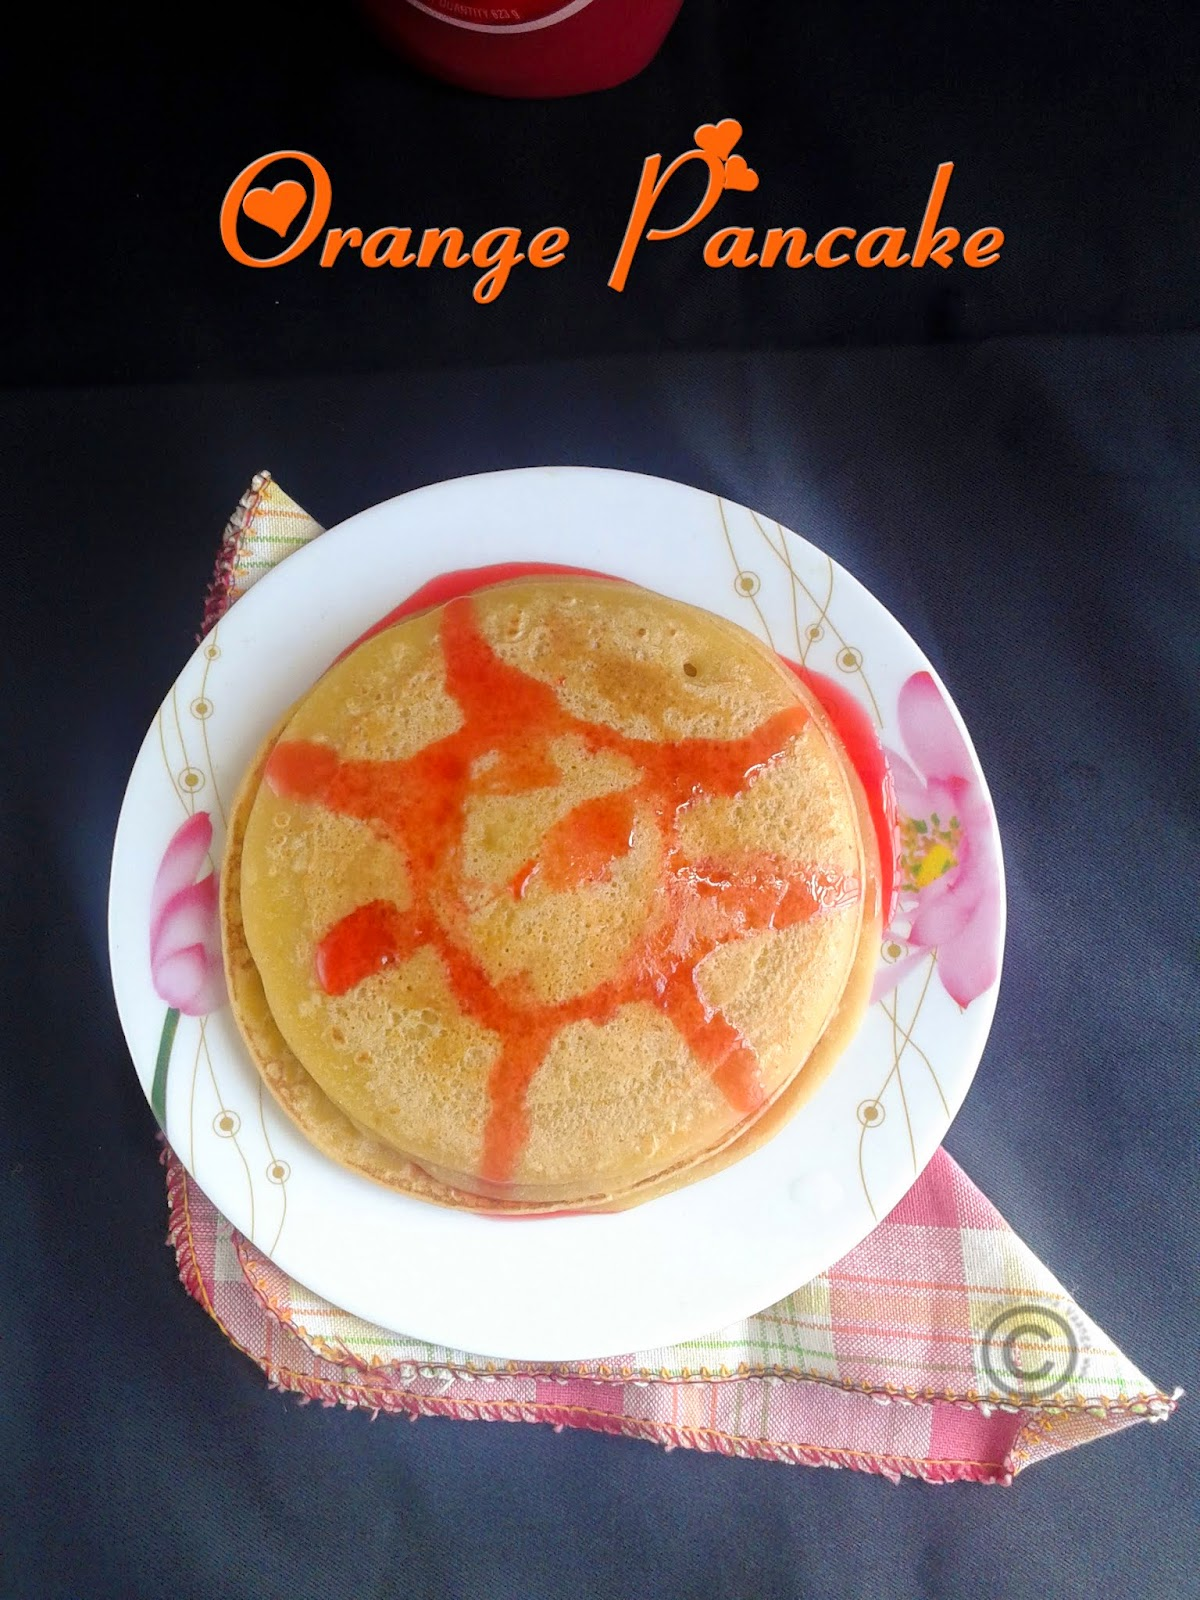 Orange-juice-pancake-breakfast